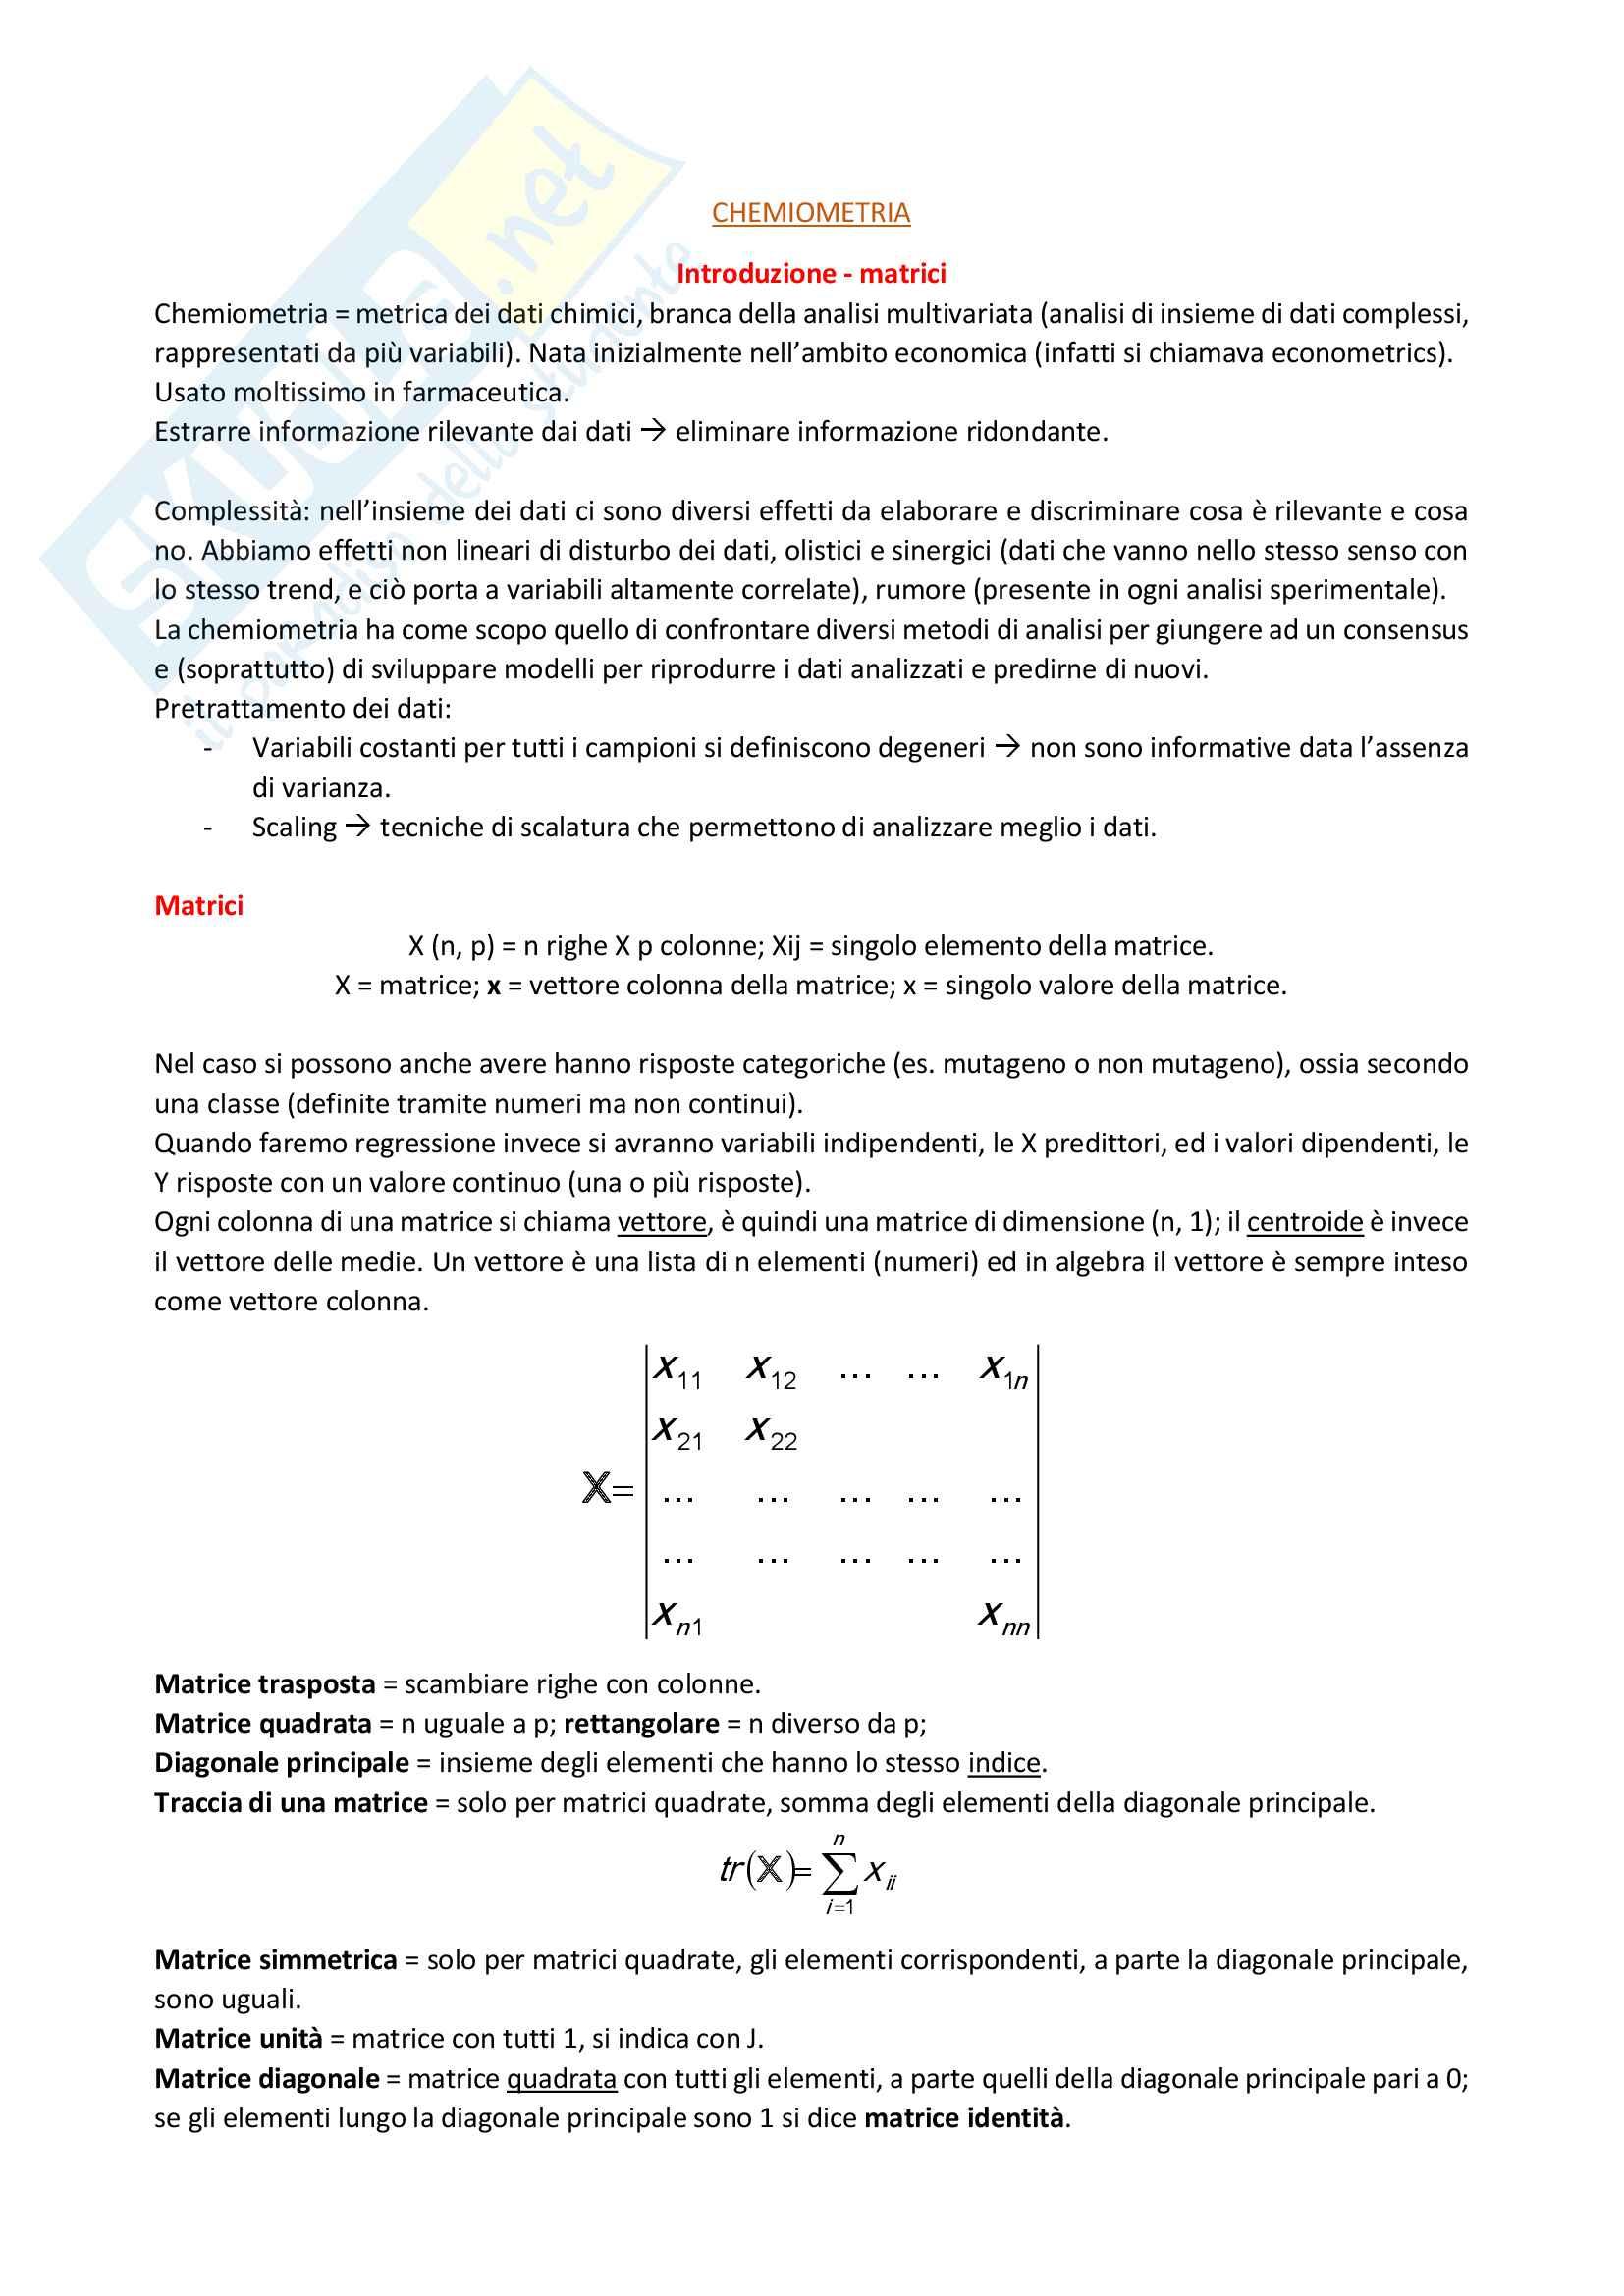 Chemiometria, prof: E. Papa